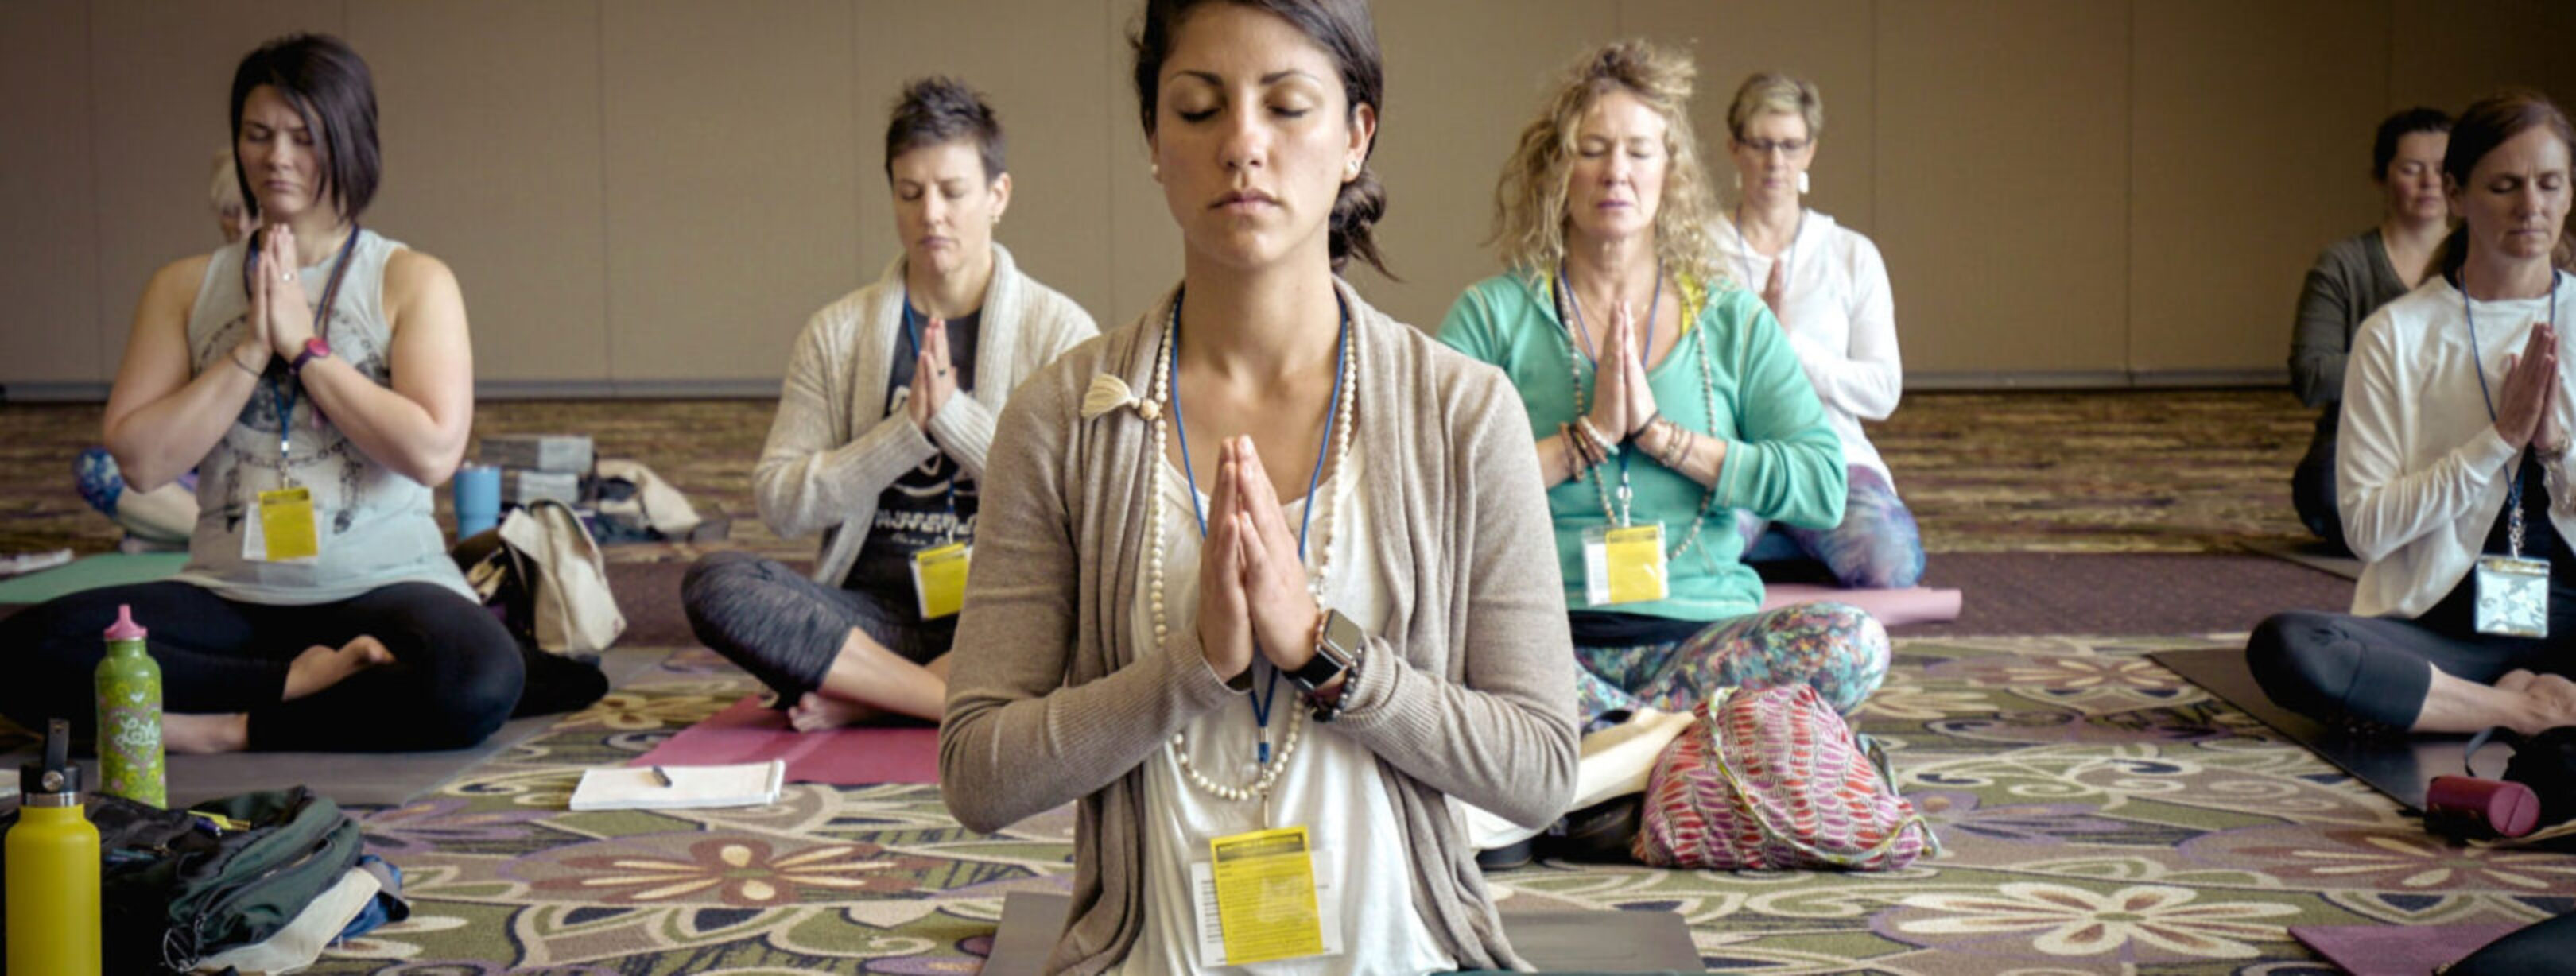 mindfulness-boeddhisme-light